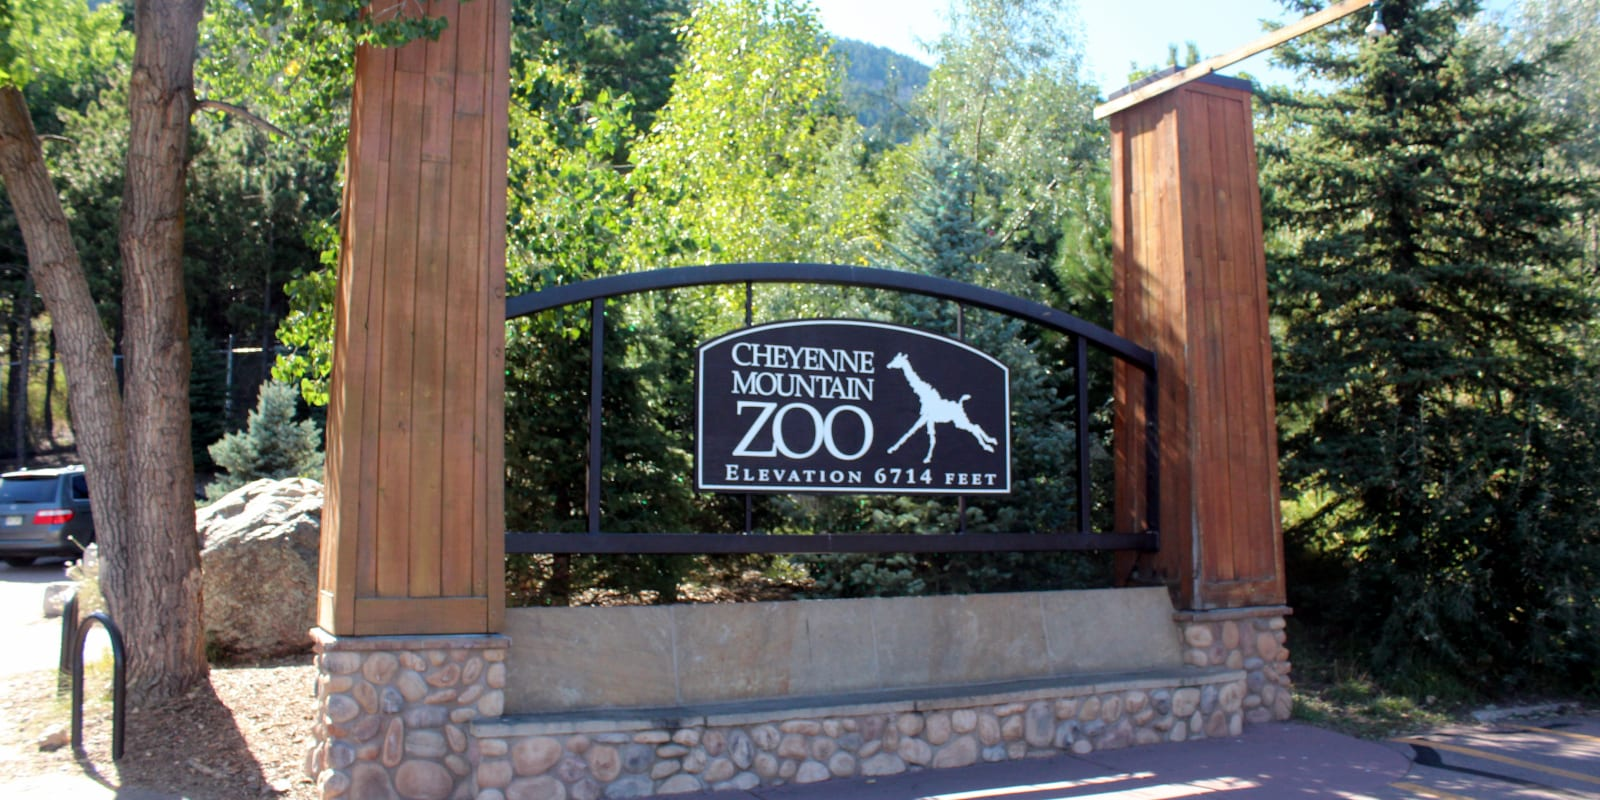 Entrance to Cheyenne Mountain Zoo, CO